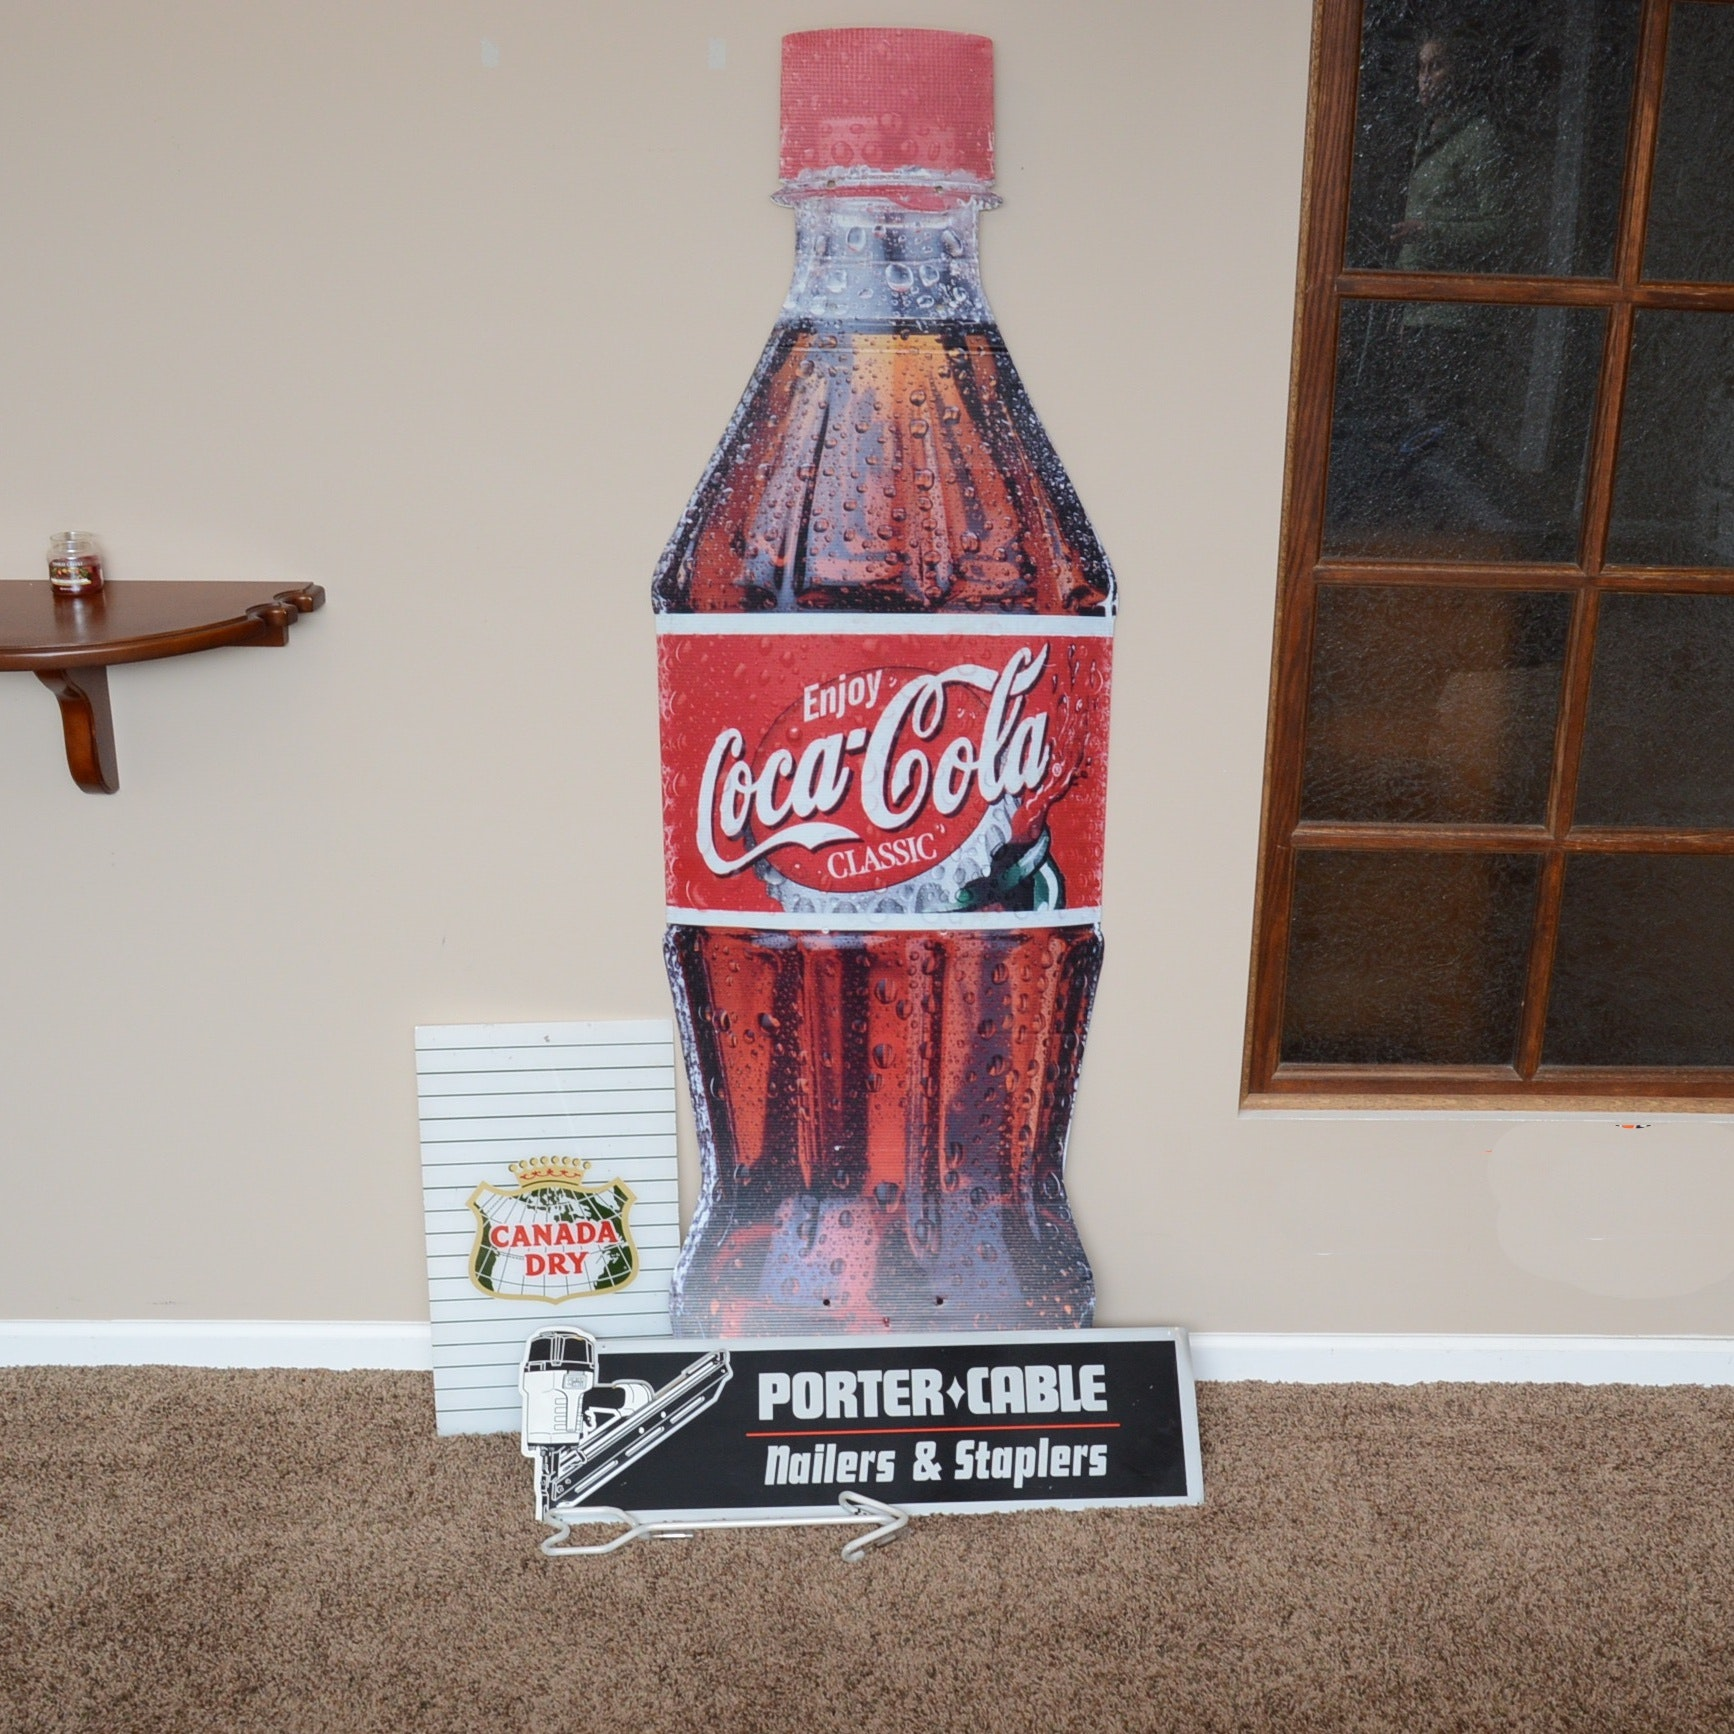 Cardboard Coca-Cola Bottle, Neon Arrow and More